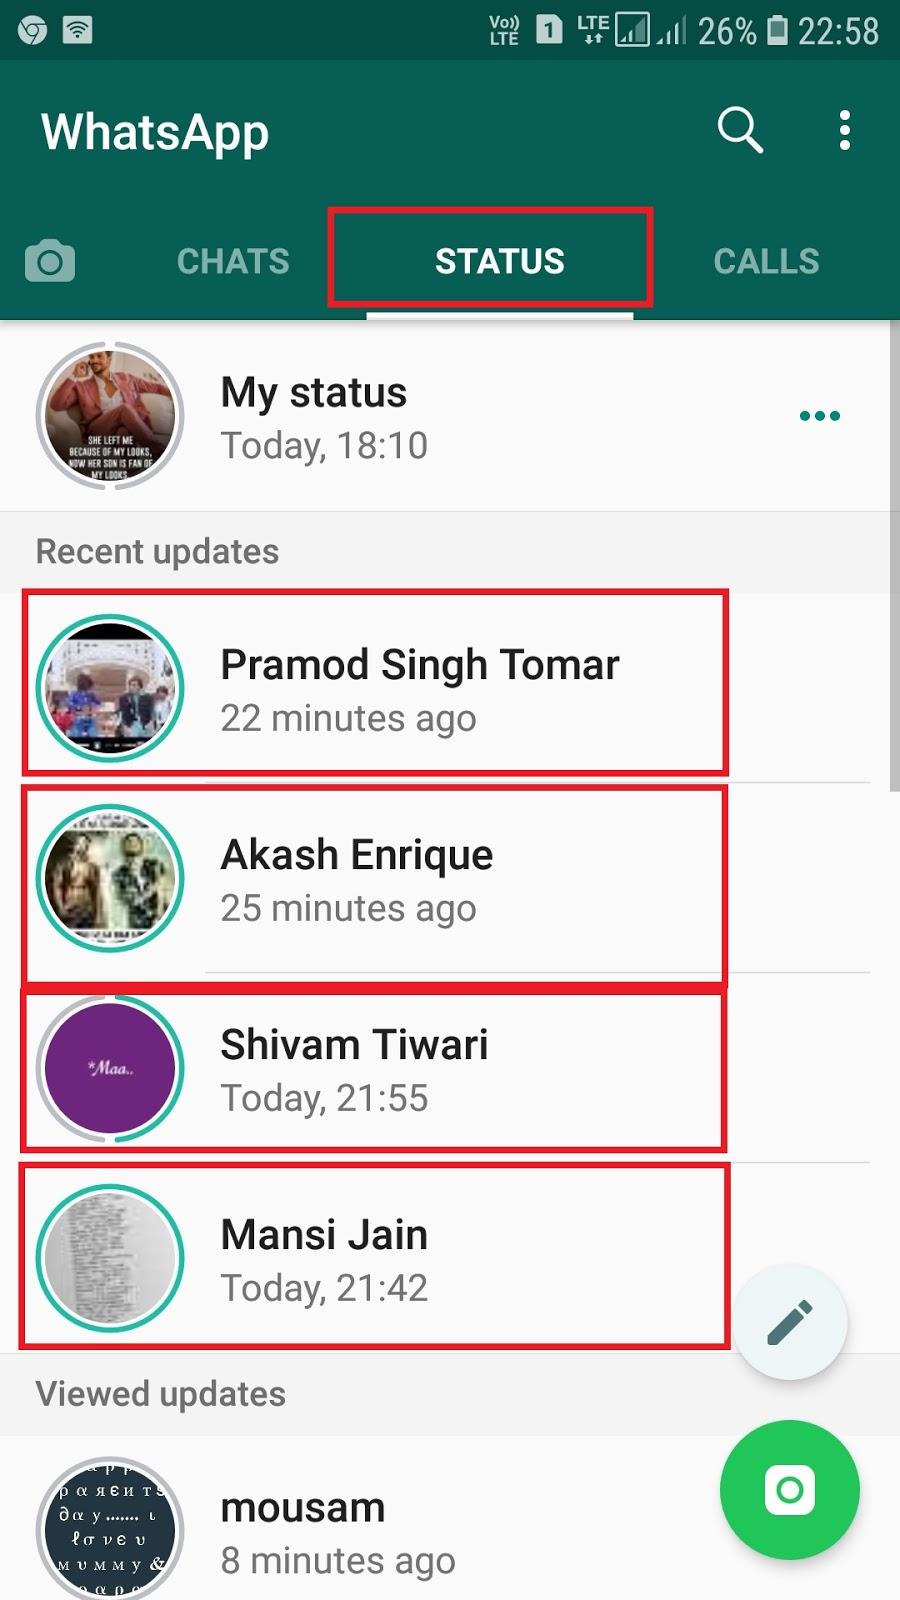 whatsapp status kaise dekhe और whatsapp status kaise dale